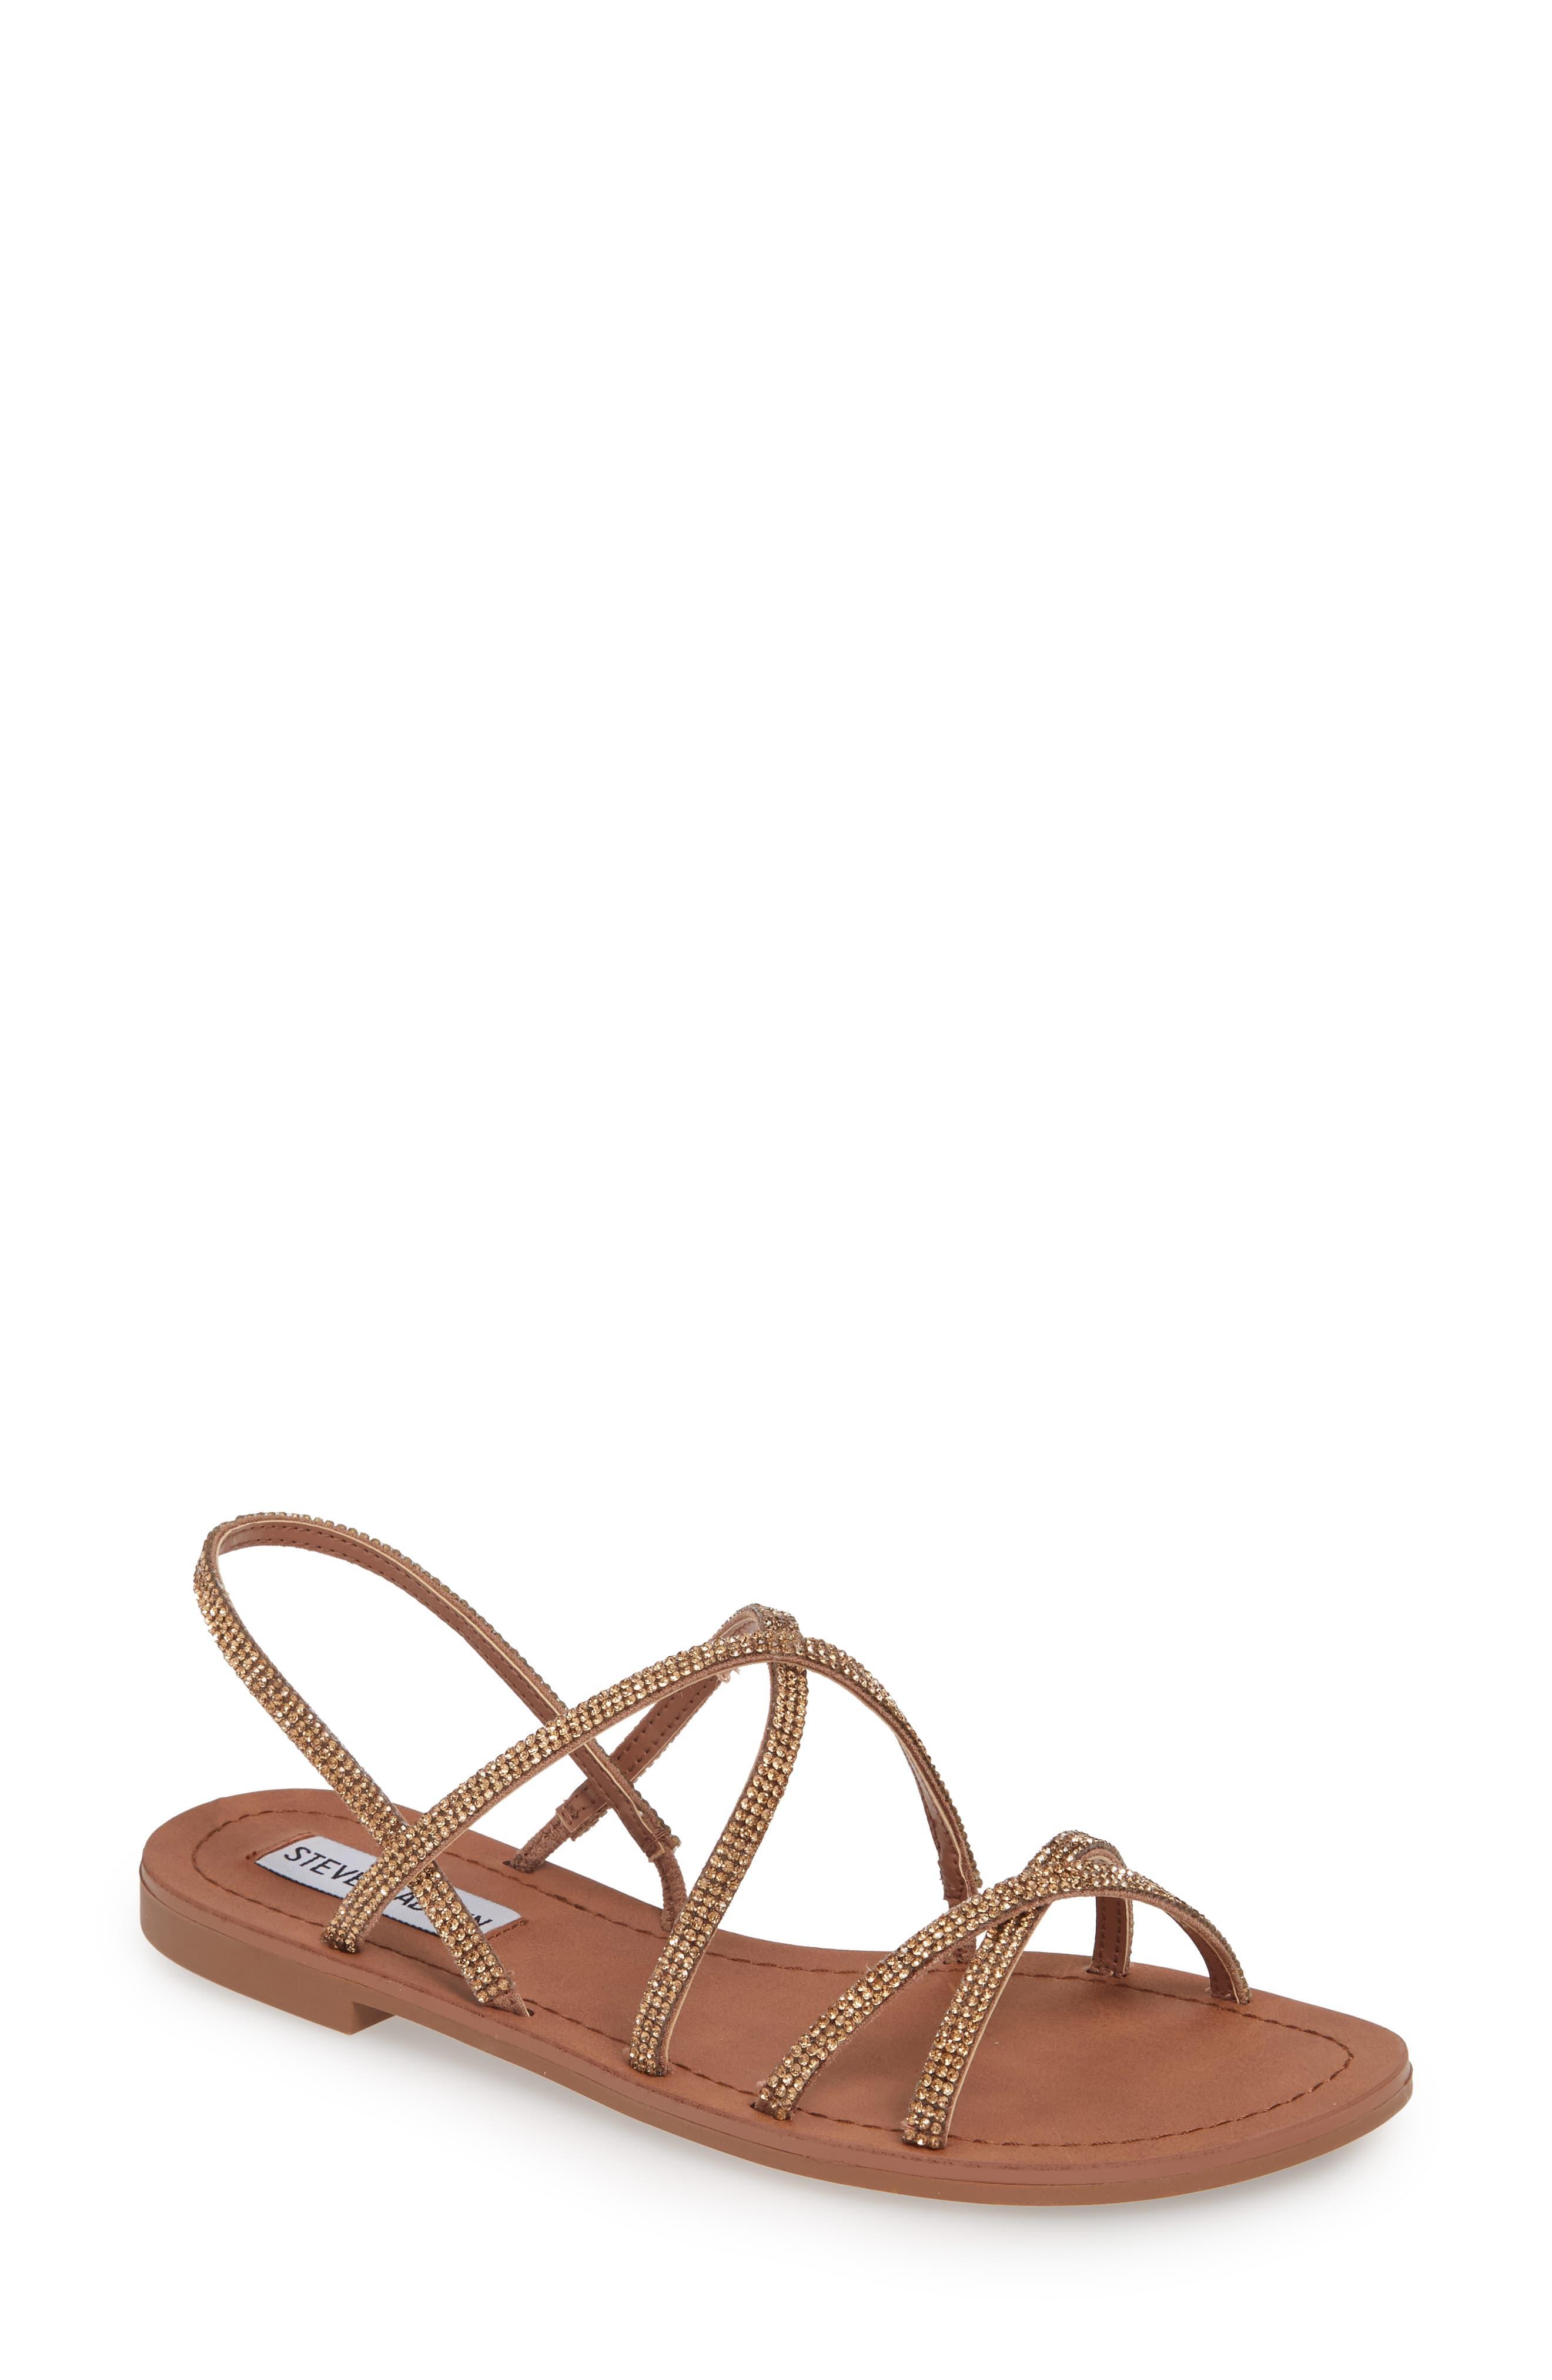 50bf85761ab Women's Steve Madden Rita Embellished Strappy Sandal, Size 5.5 M ...